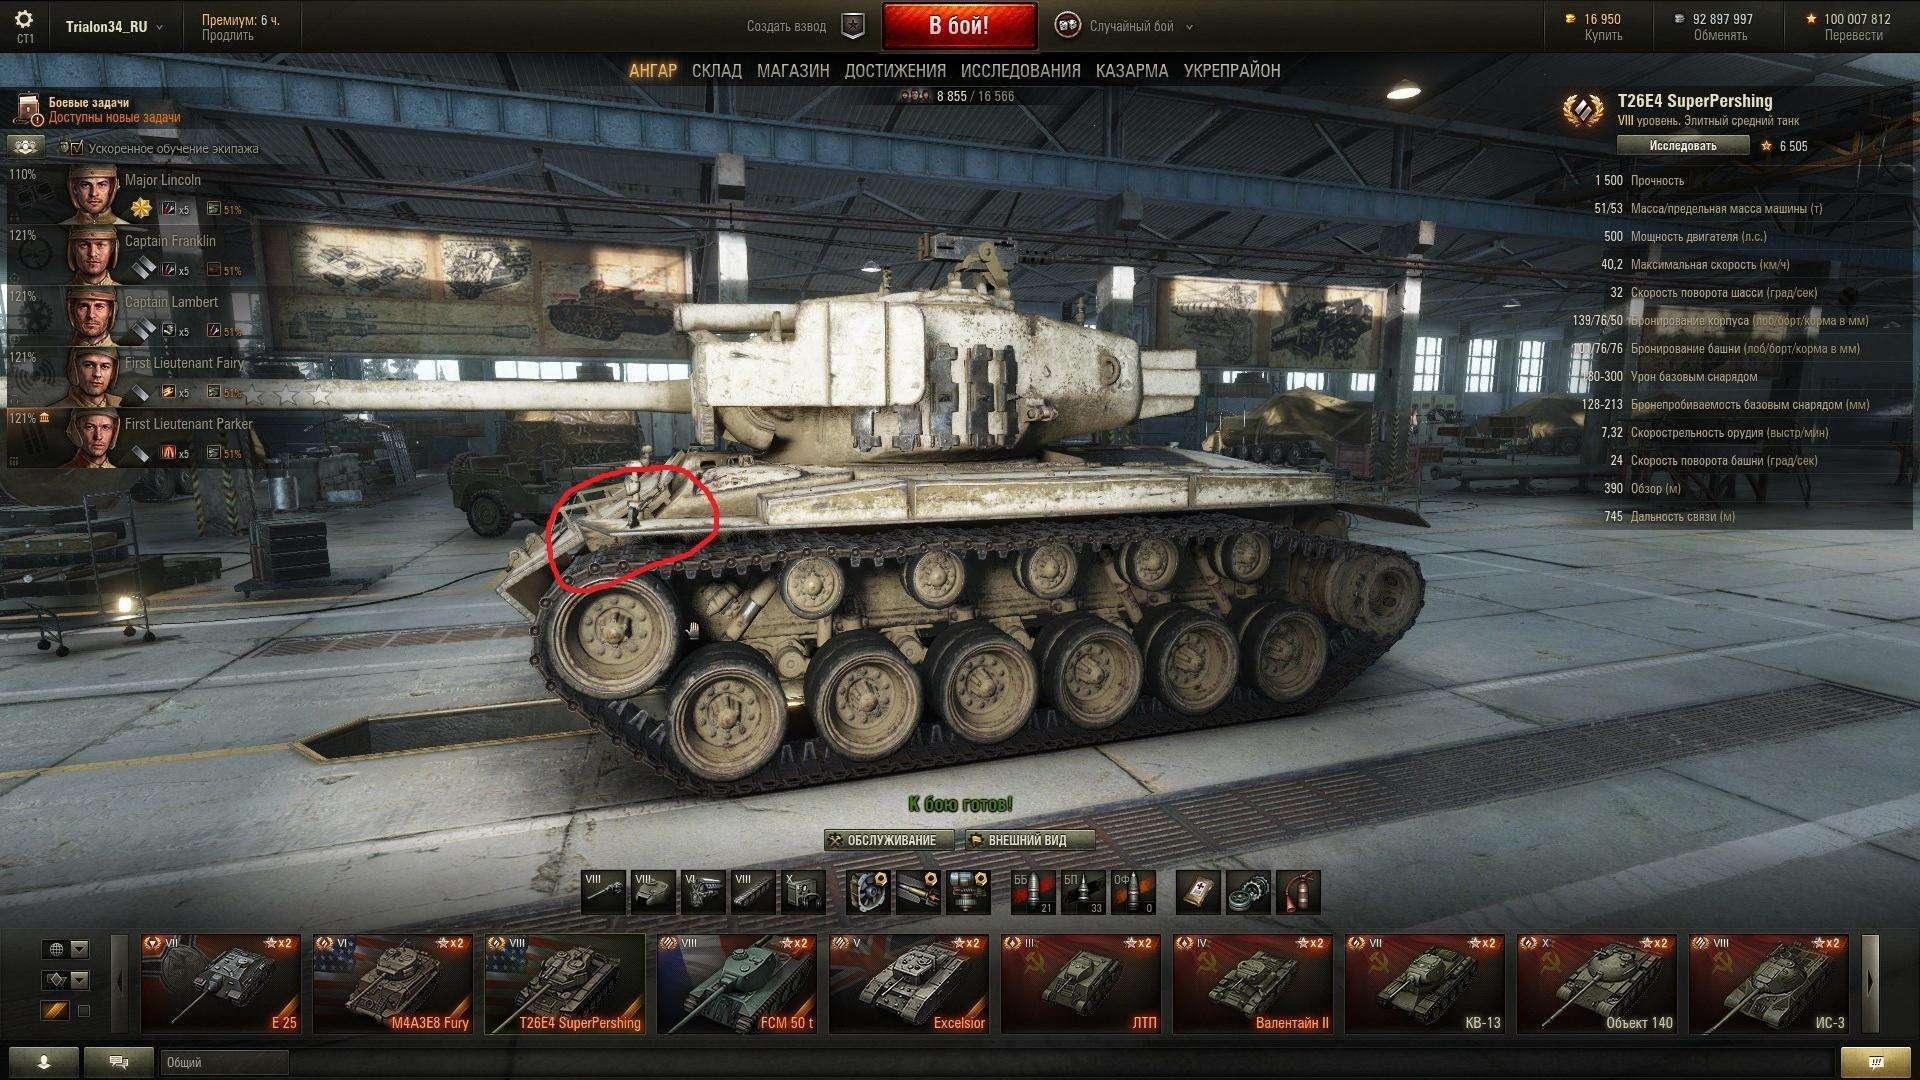 Гайды по World Of Tanks - Wot-Game